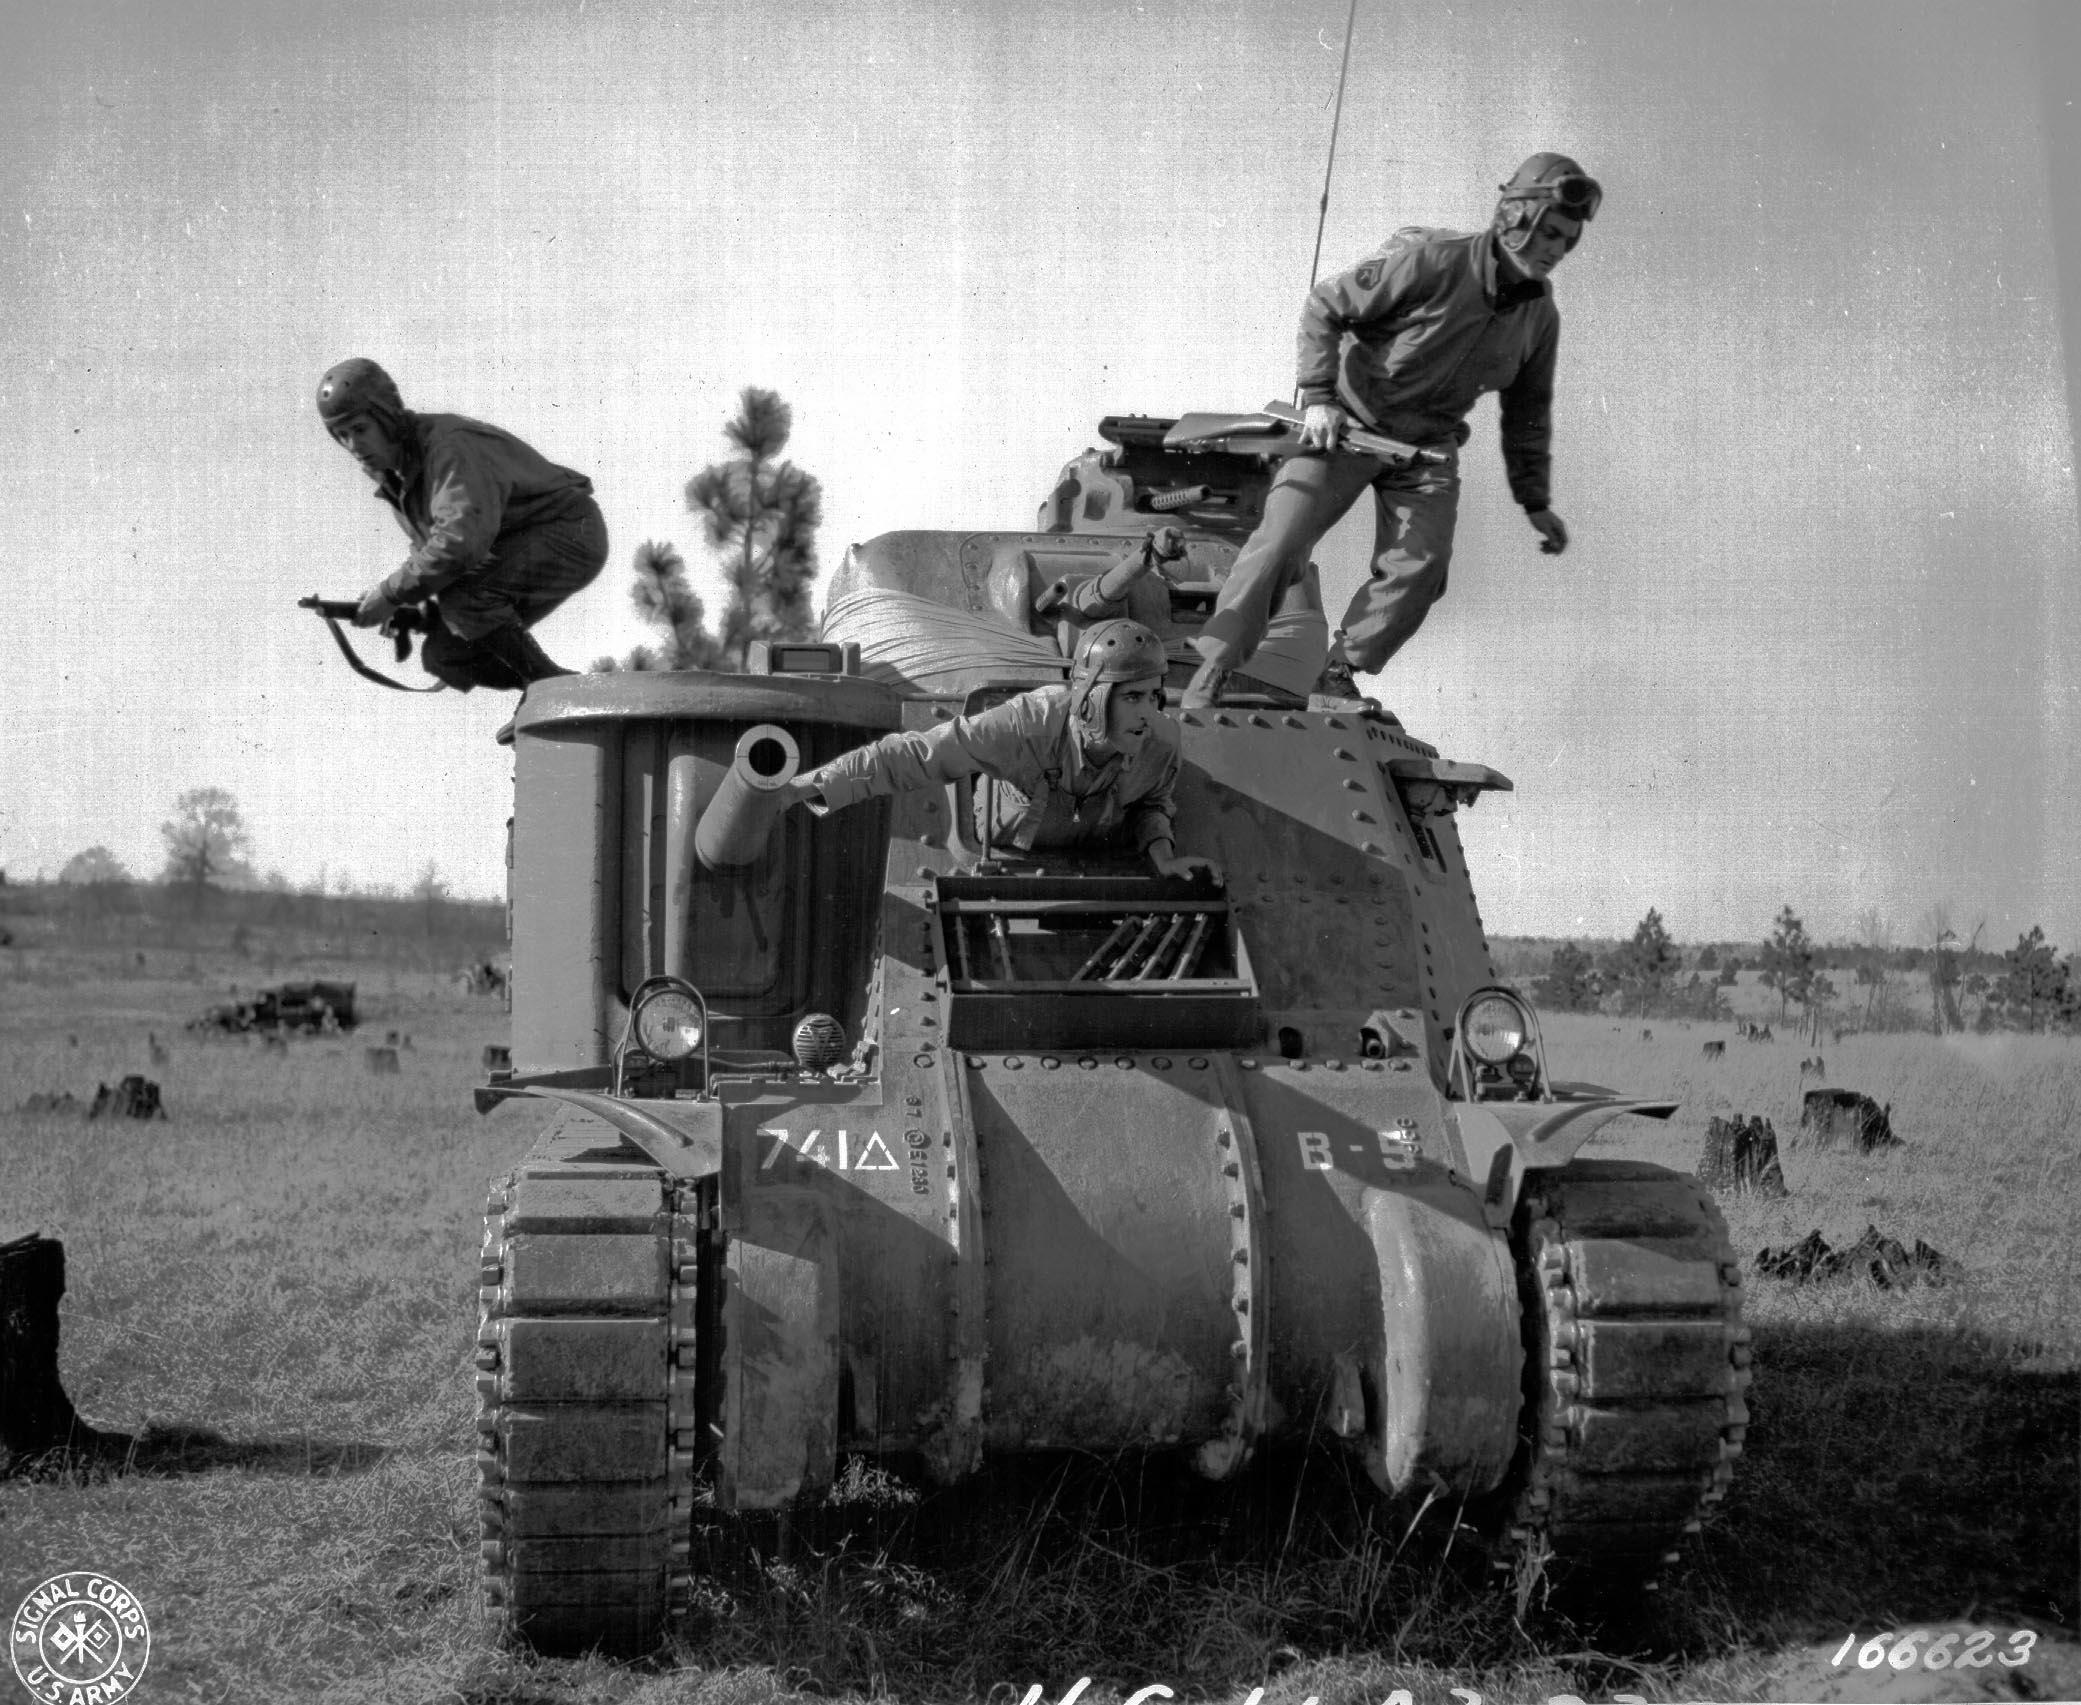 ww2 tanks american british